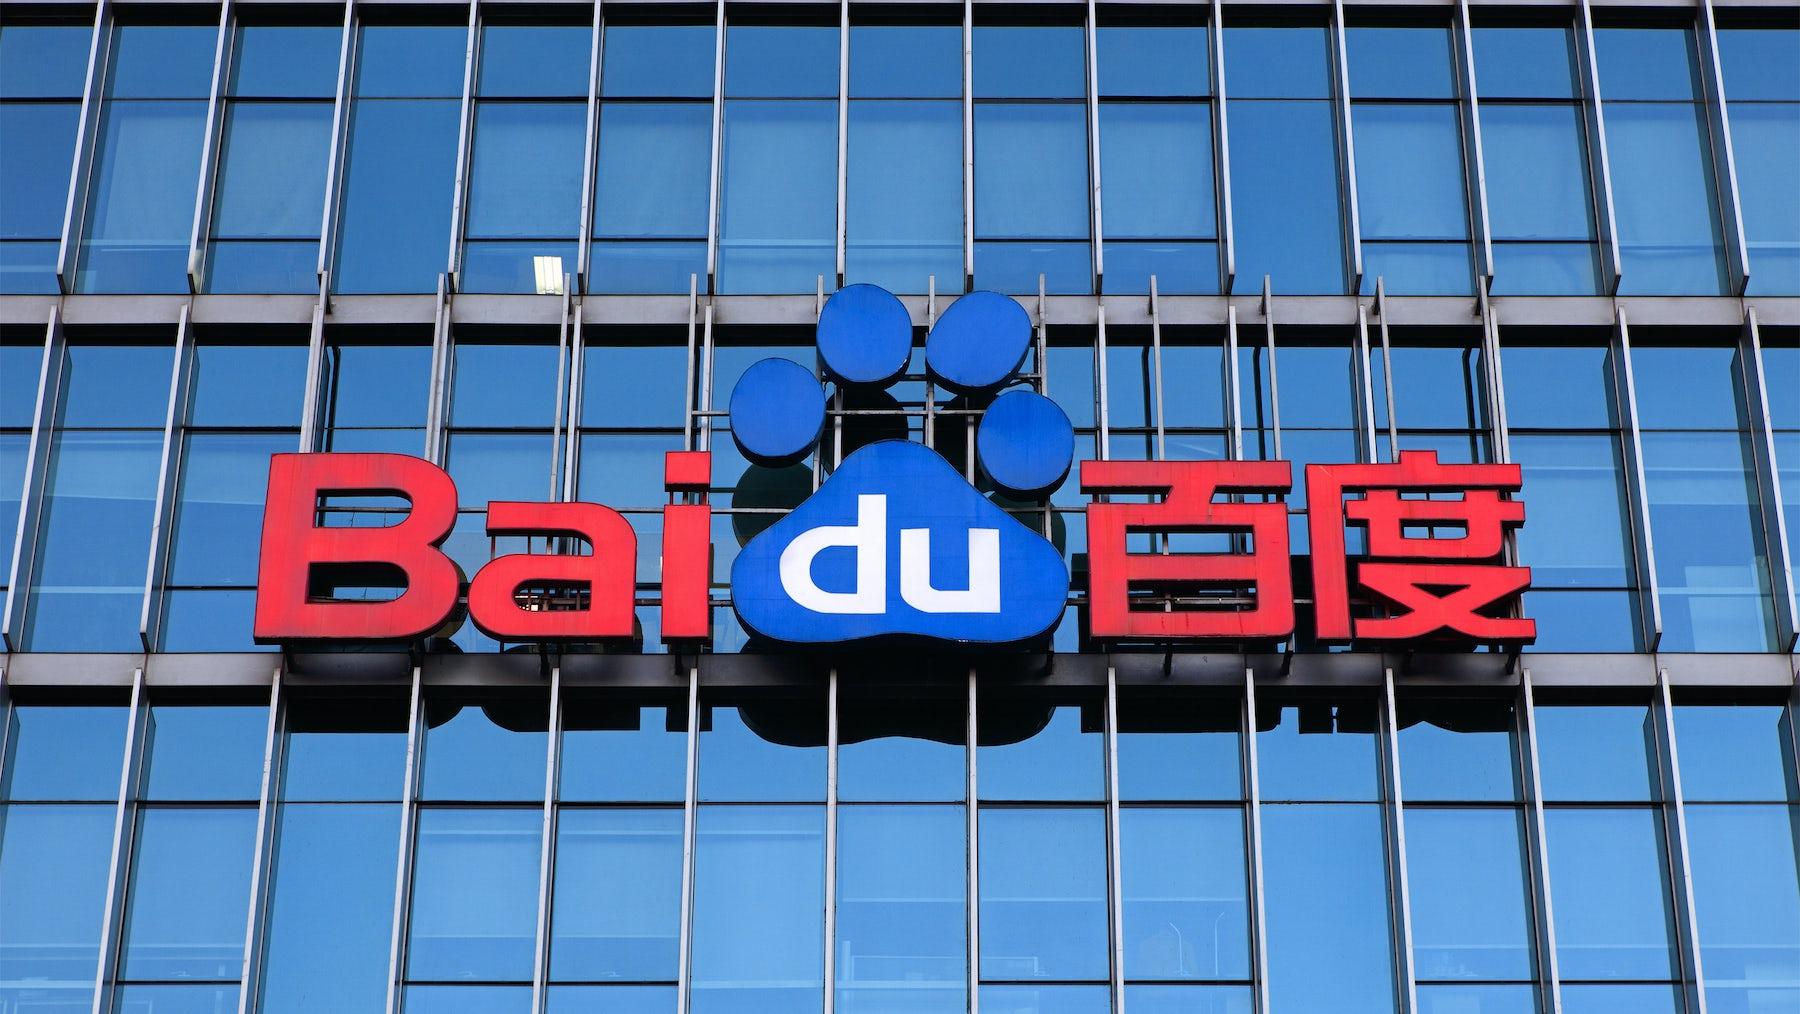 Baidu   Source: Shutterstock